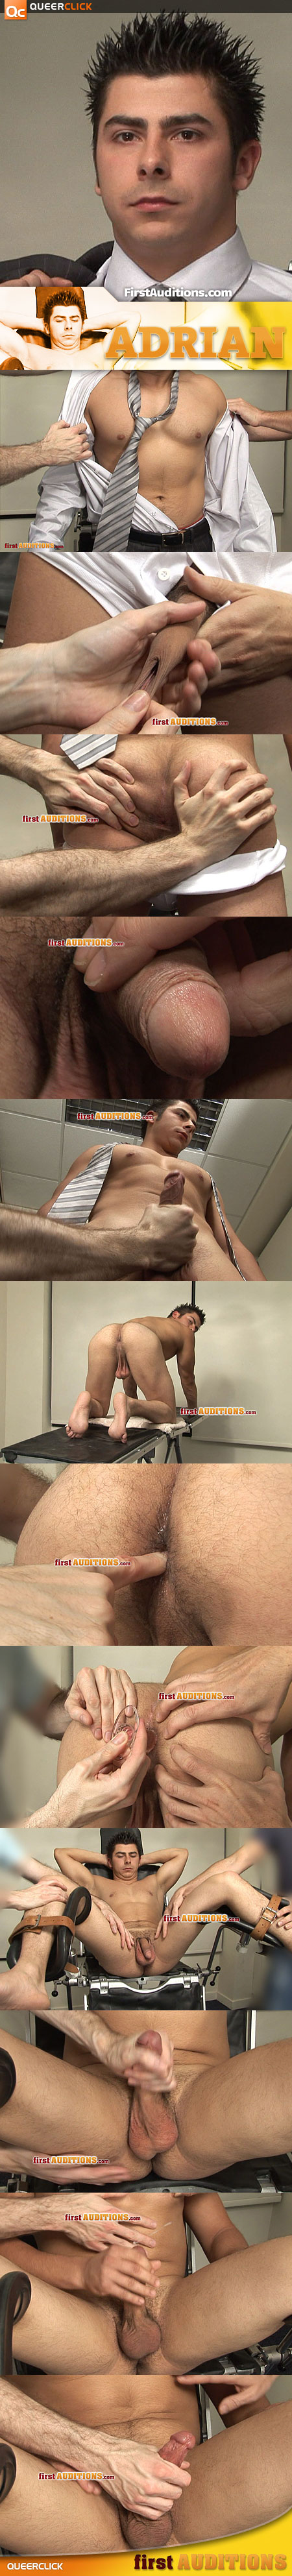 Dick huge sucking woman